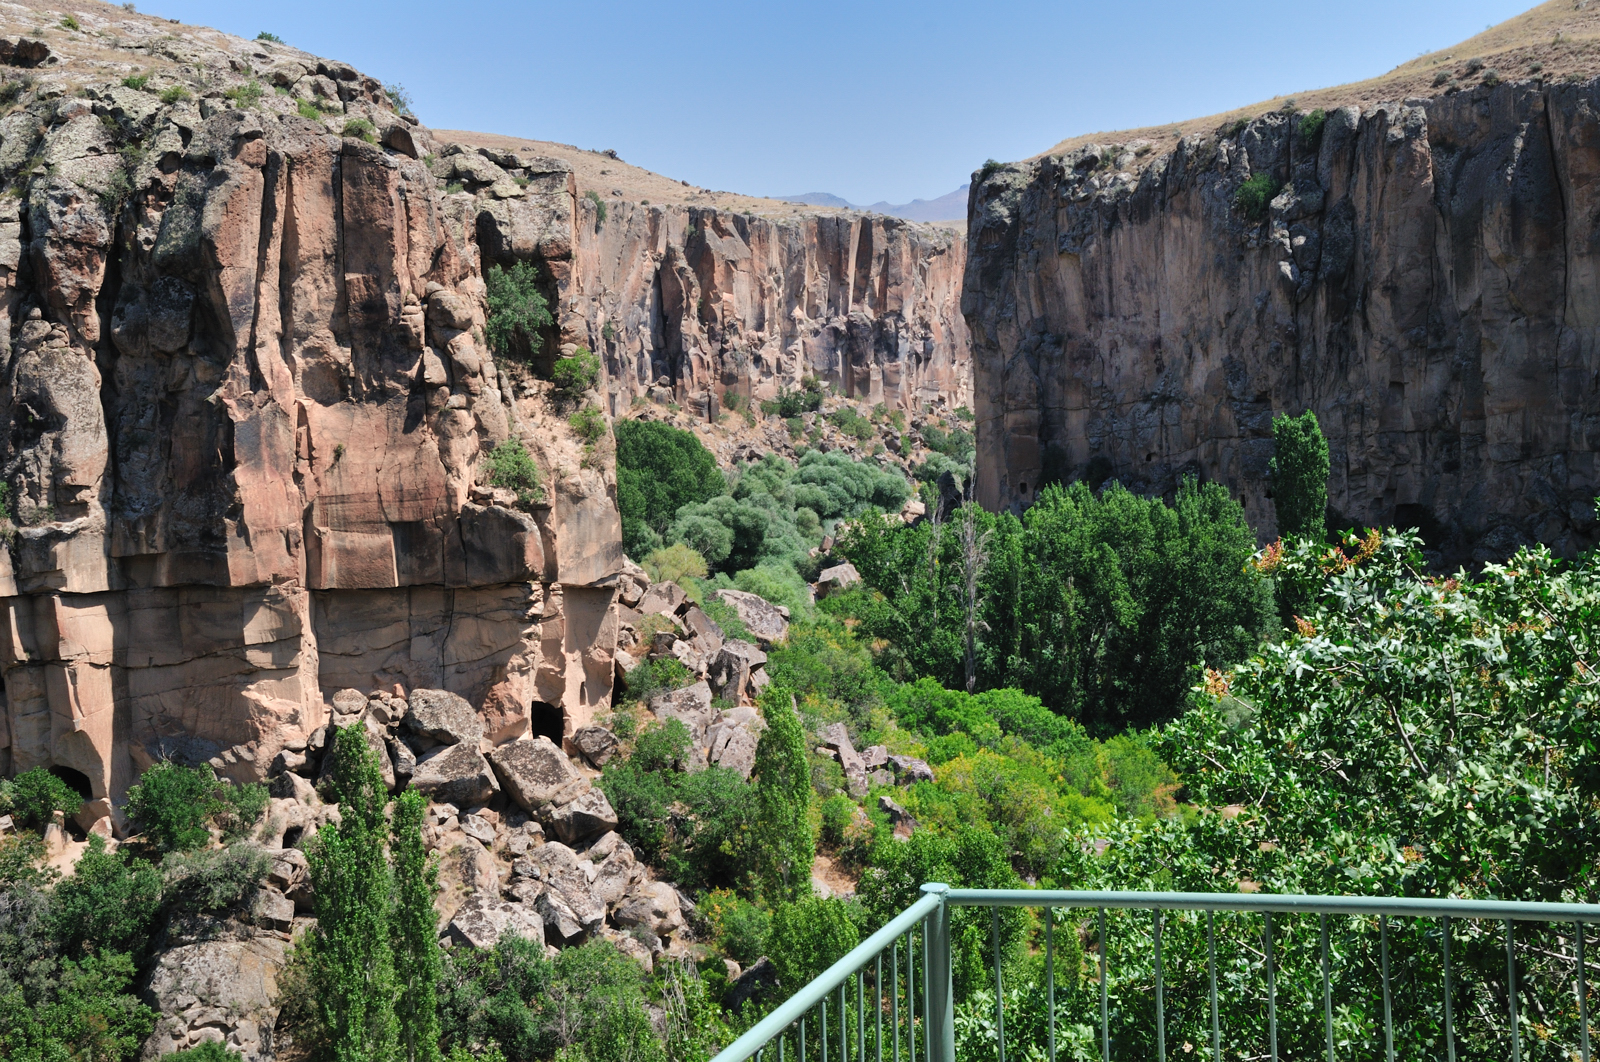 Phoebettmh Travel: (Turkey) – Cappadocia - Land of fairy chimneys